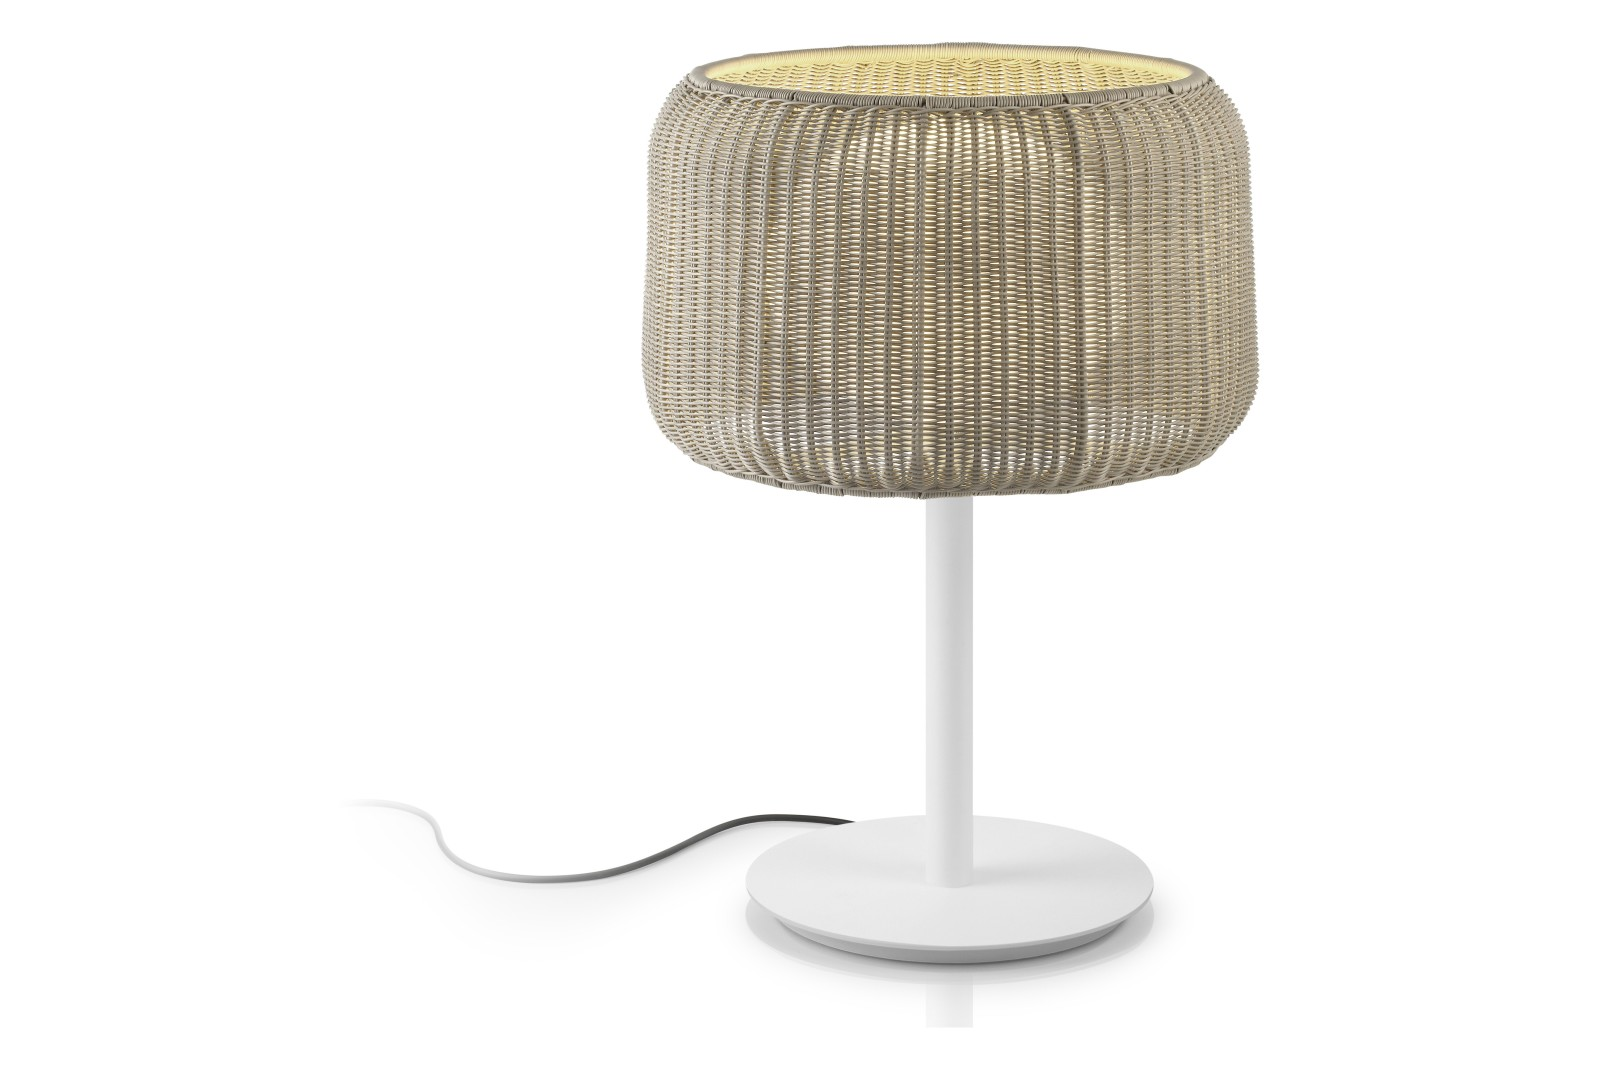 Fora M Table Lamp Light Beige, Natural White